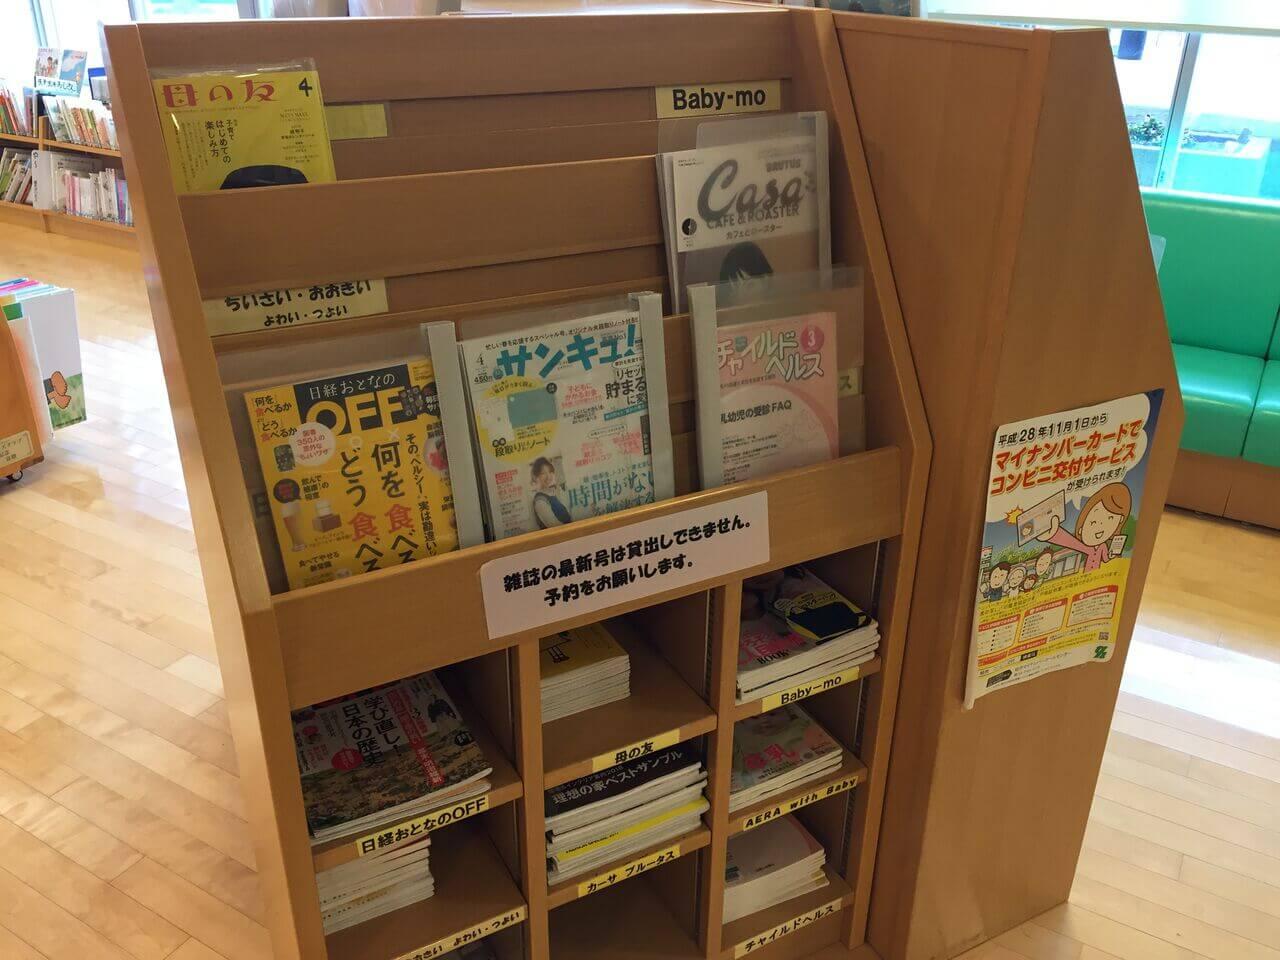 大人が読める雑誌も充実-002